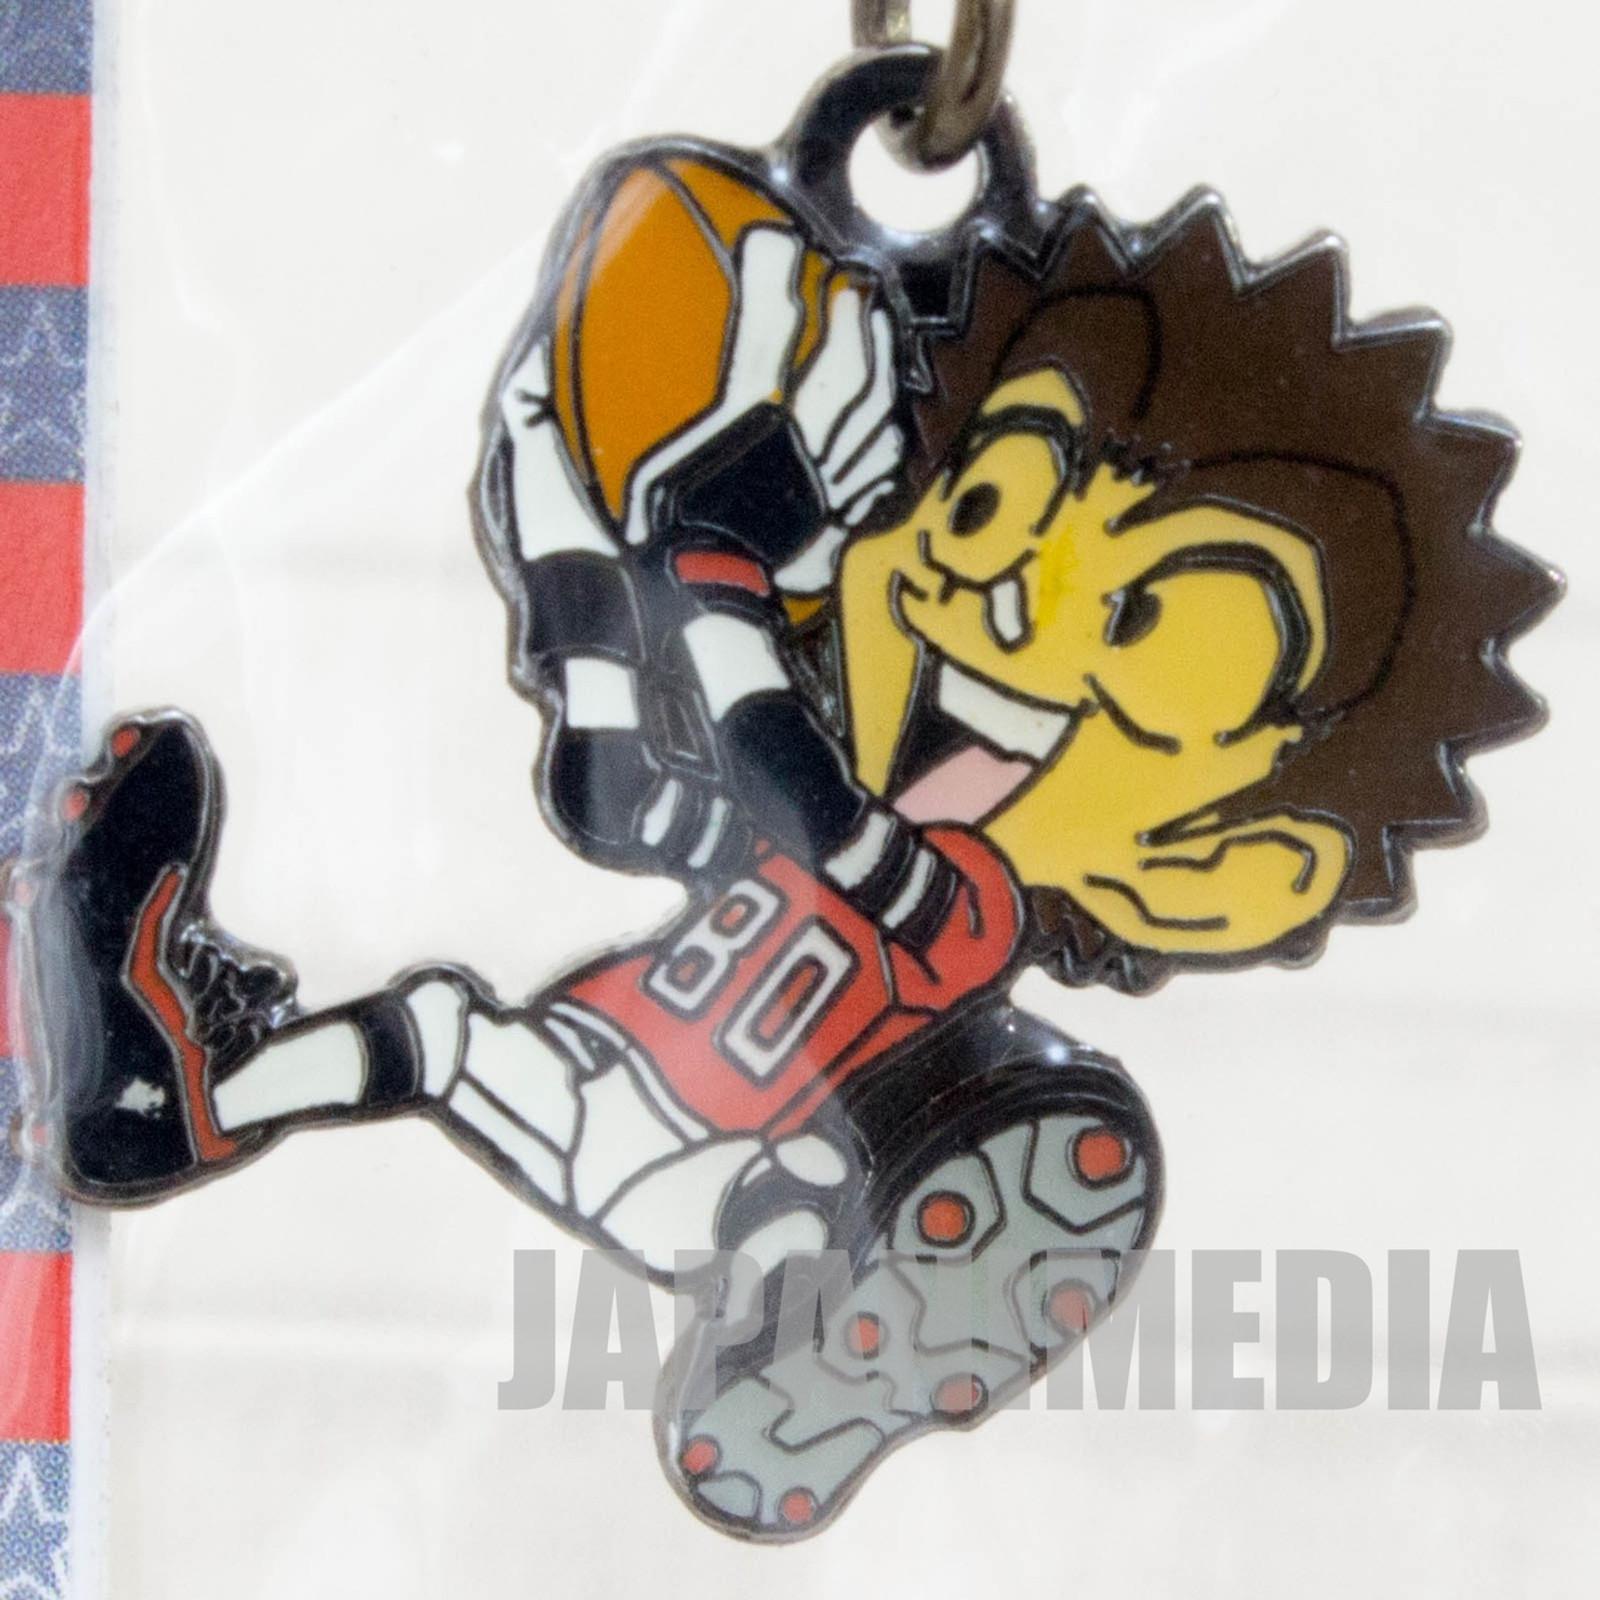 Eyeshield 21 Monta Taro Raimon DEIMON DEVILBATS Mascot Charm JAPAN ANIME MANGA